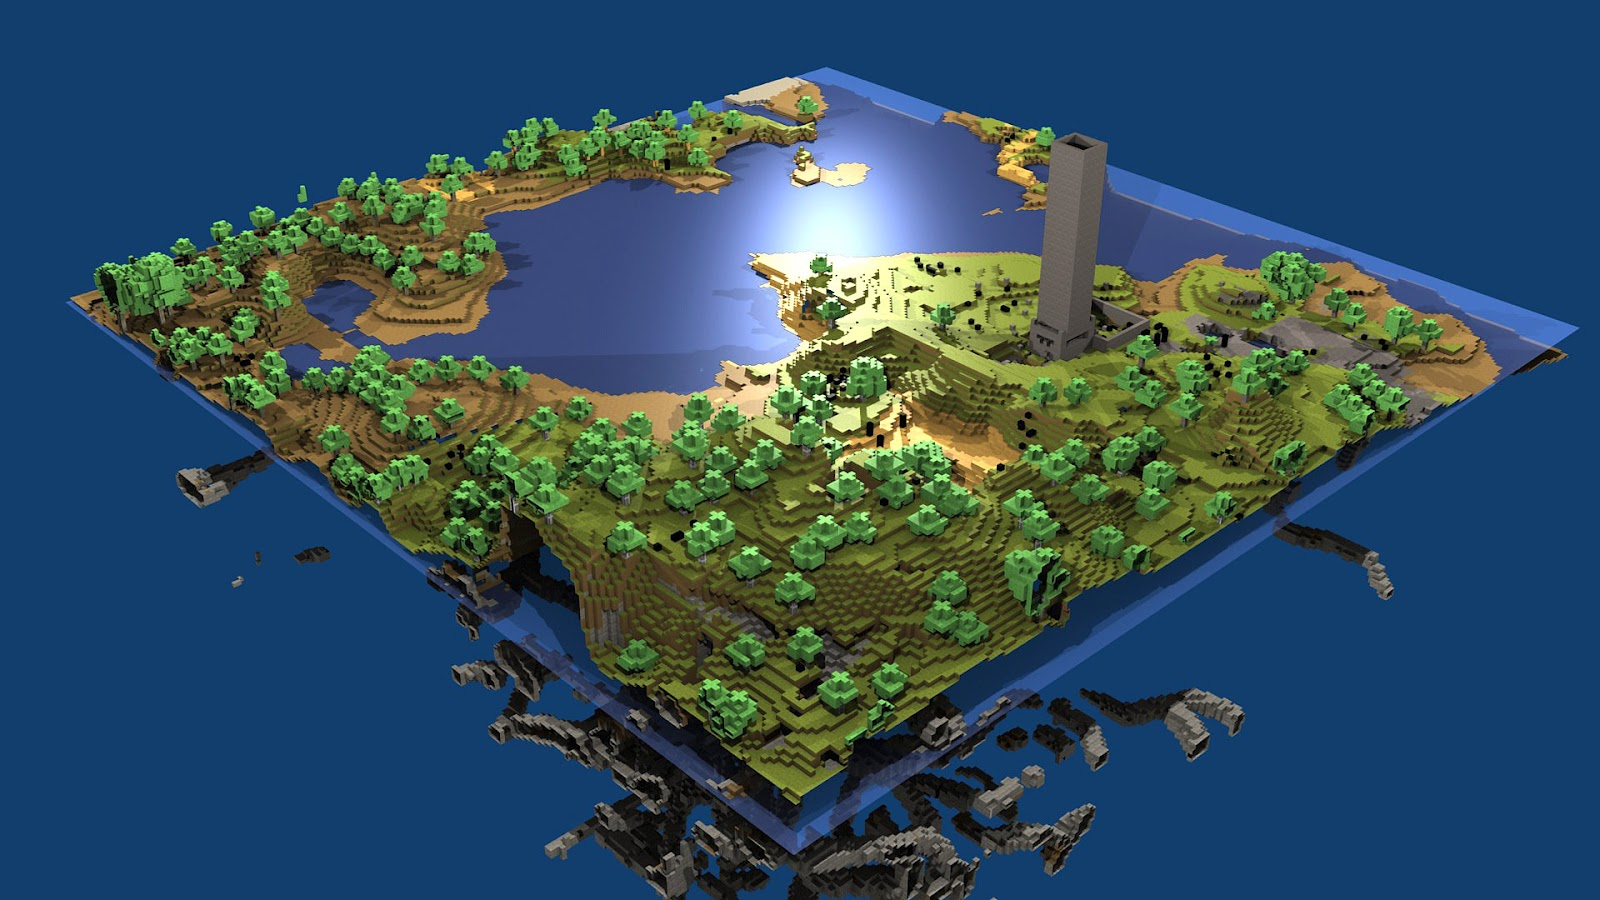 mapa do minecraft Mods, mapas y vidios de minecraft!: MAPAS DE MINECRAFT mapa do minecraft